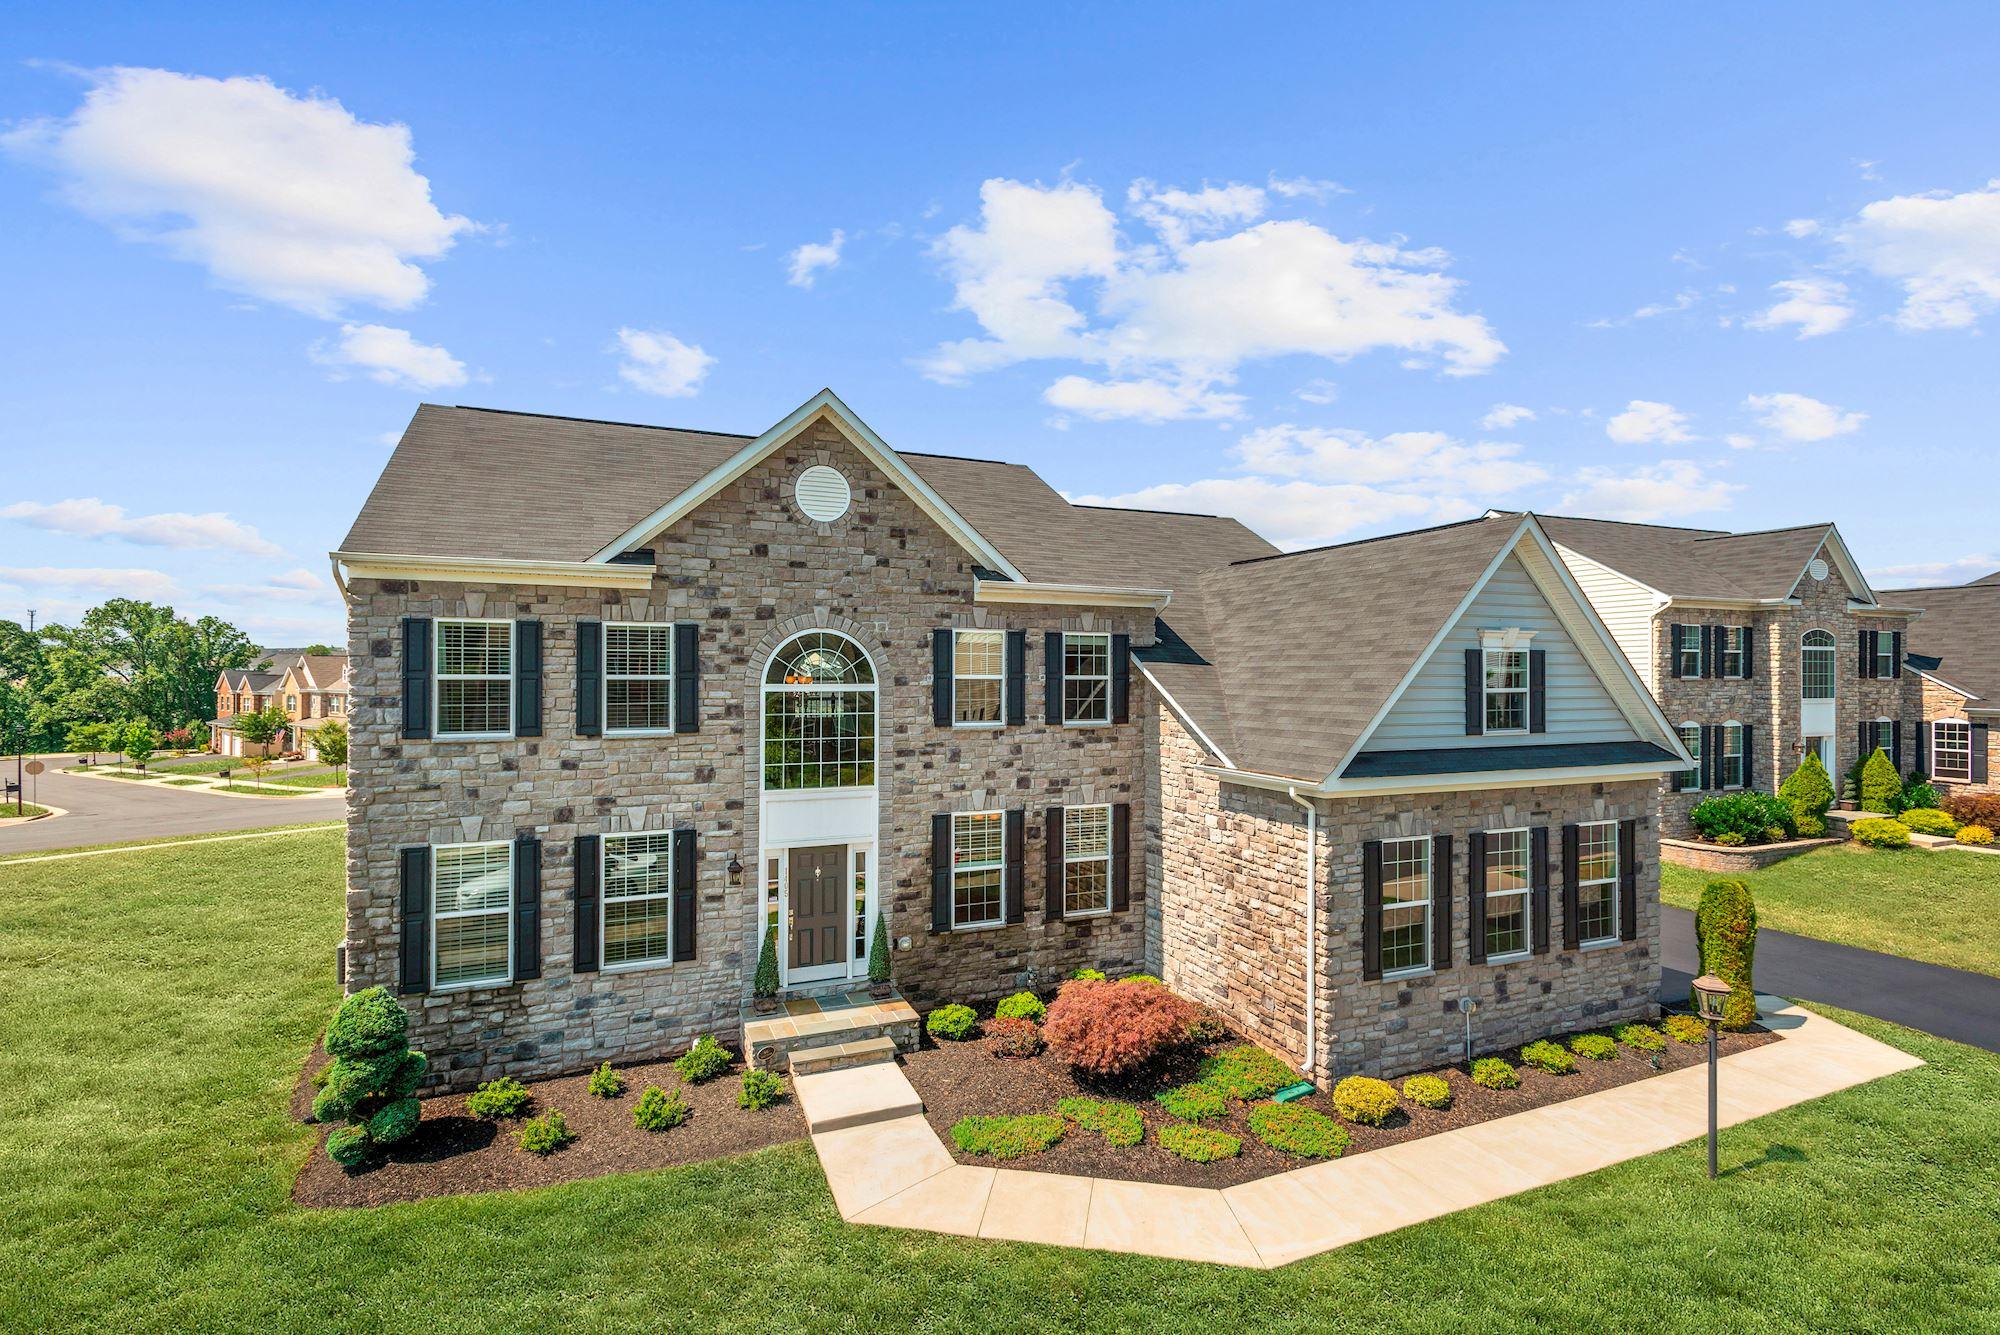 River Pointe Estates in Leesburg, VA: Elegant K. Hovnanian ...